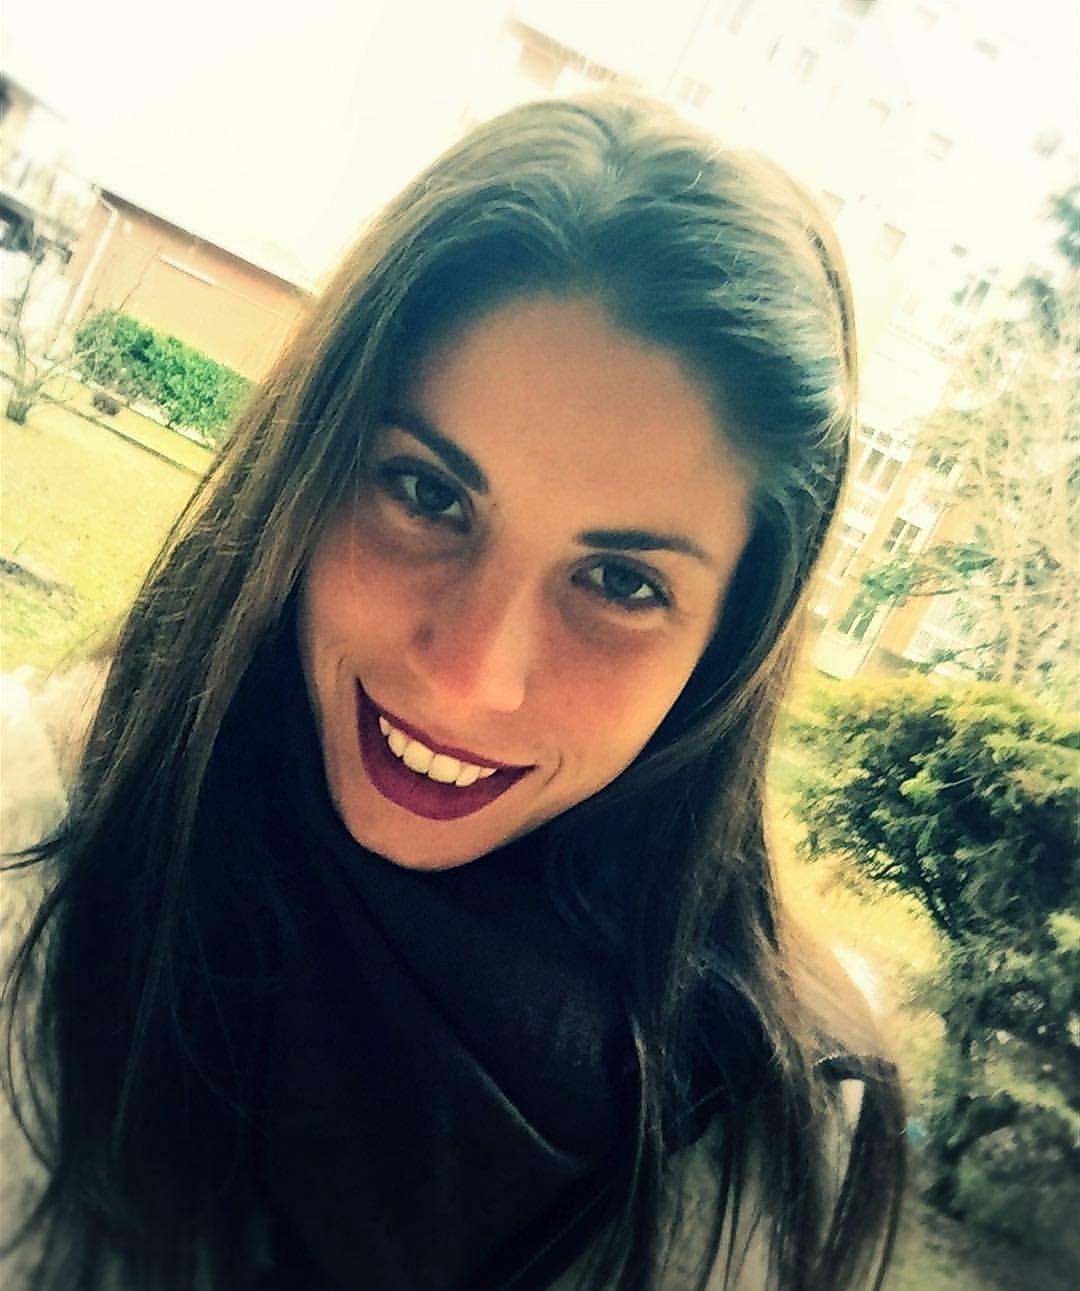 Claudia Franzè classe 1990 , best ranking n.1030 del mondo